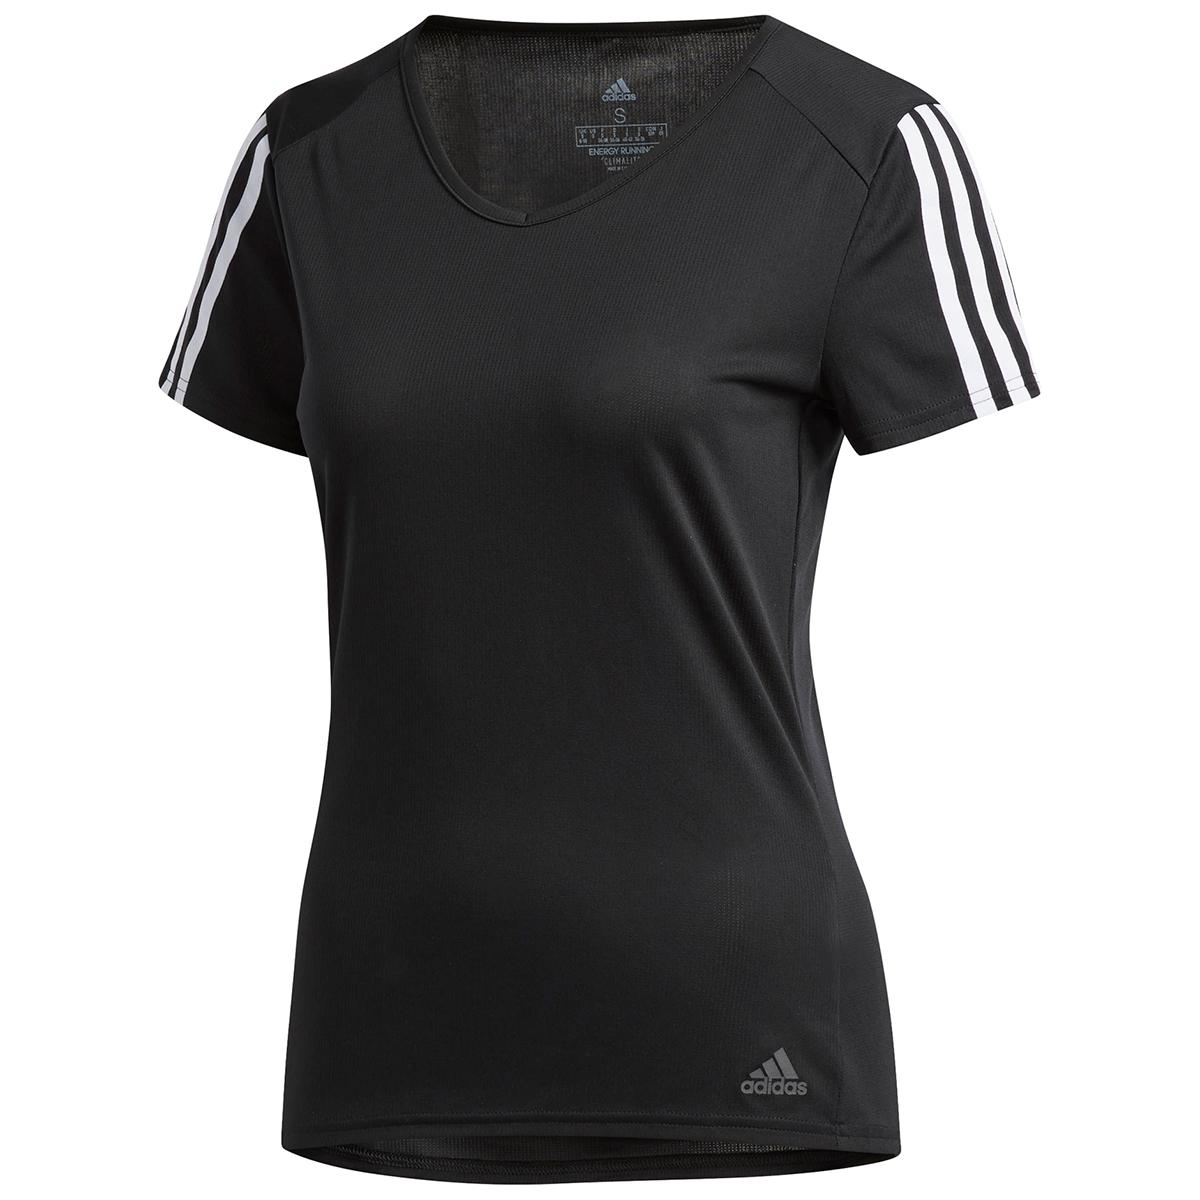 Adidas Women's Running 3-Stripe Short-Sleeve Tee - Black, S